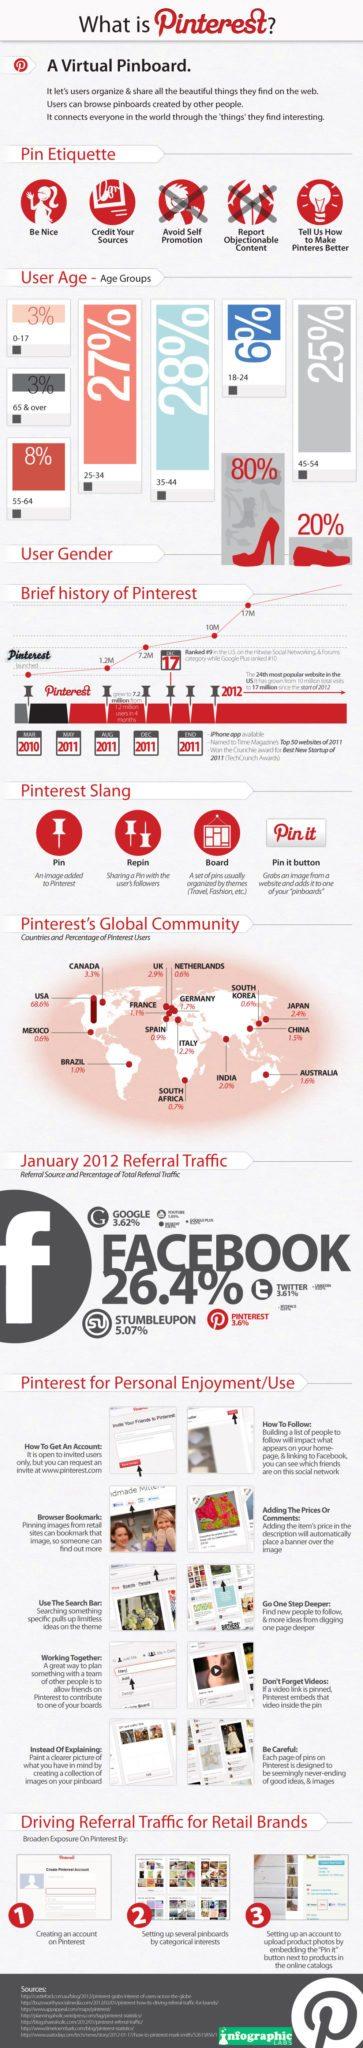 Pinterest Infographic